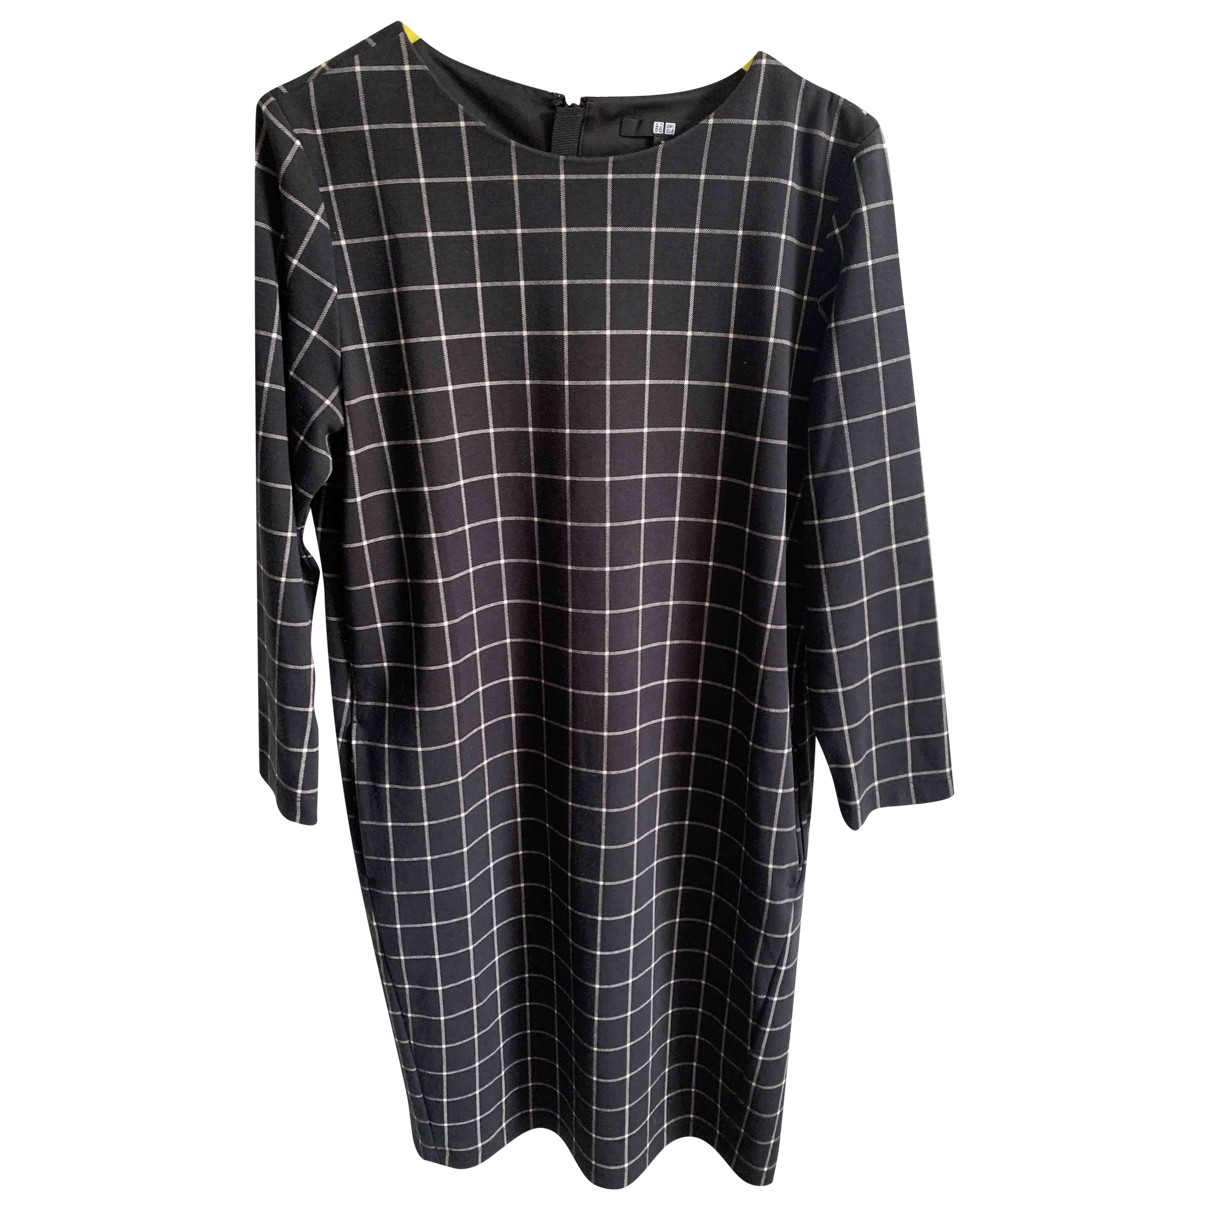 Uniqlo \N Kleid in  Schwarz Baumwolle